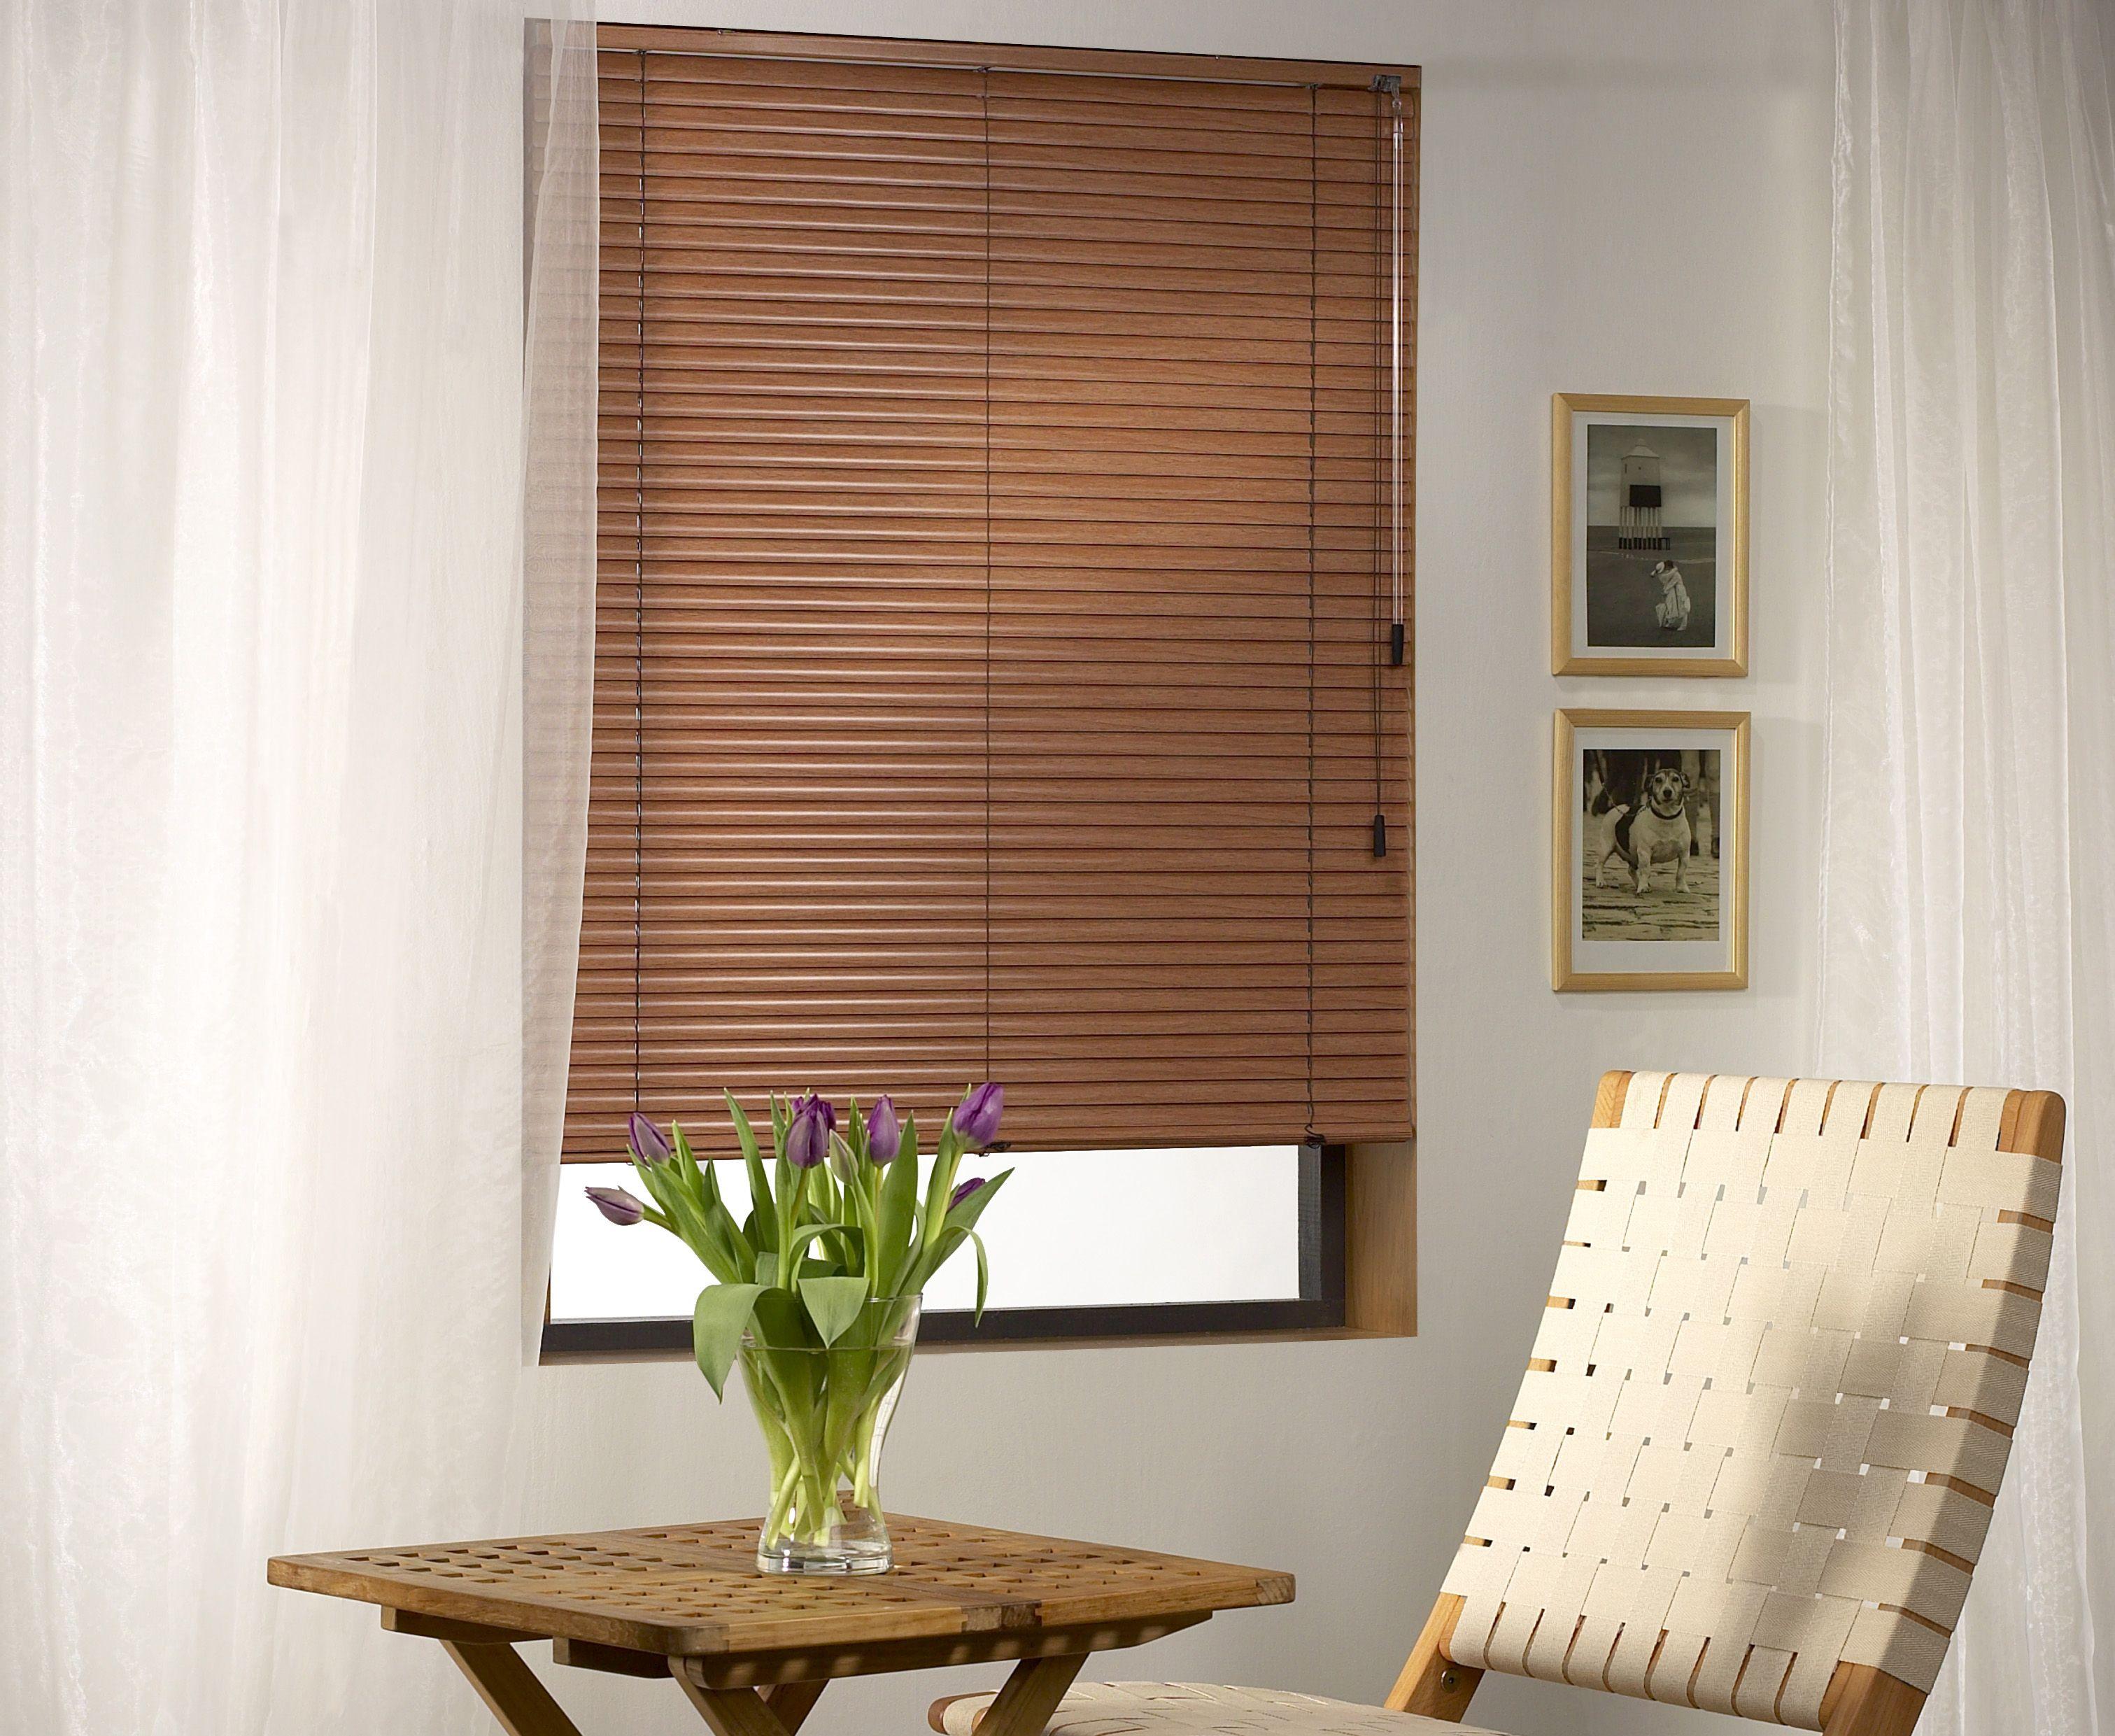 Aluminum slats for 25mm venetian shutters buy aluminium - Get The Look Of Wood With A 25mm Aluminium Venetian Blind Our Wood Tones Collection